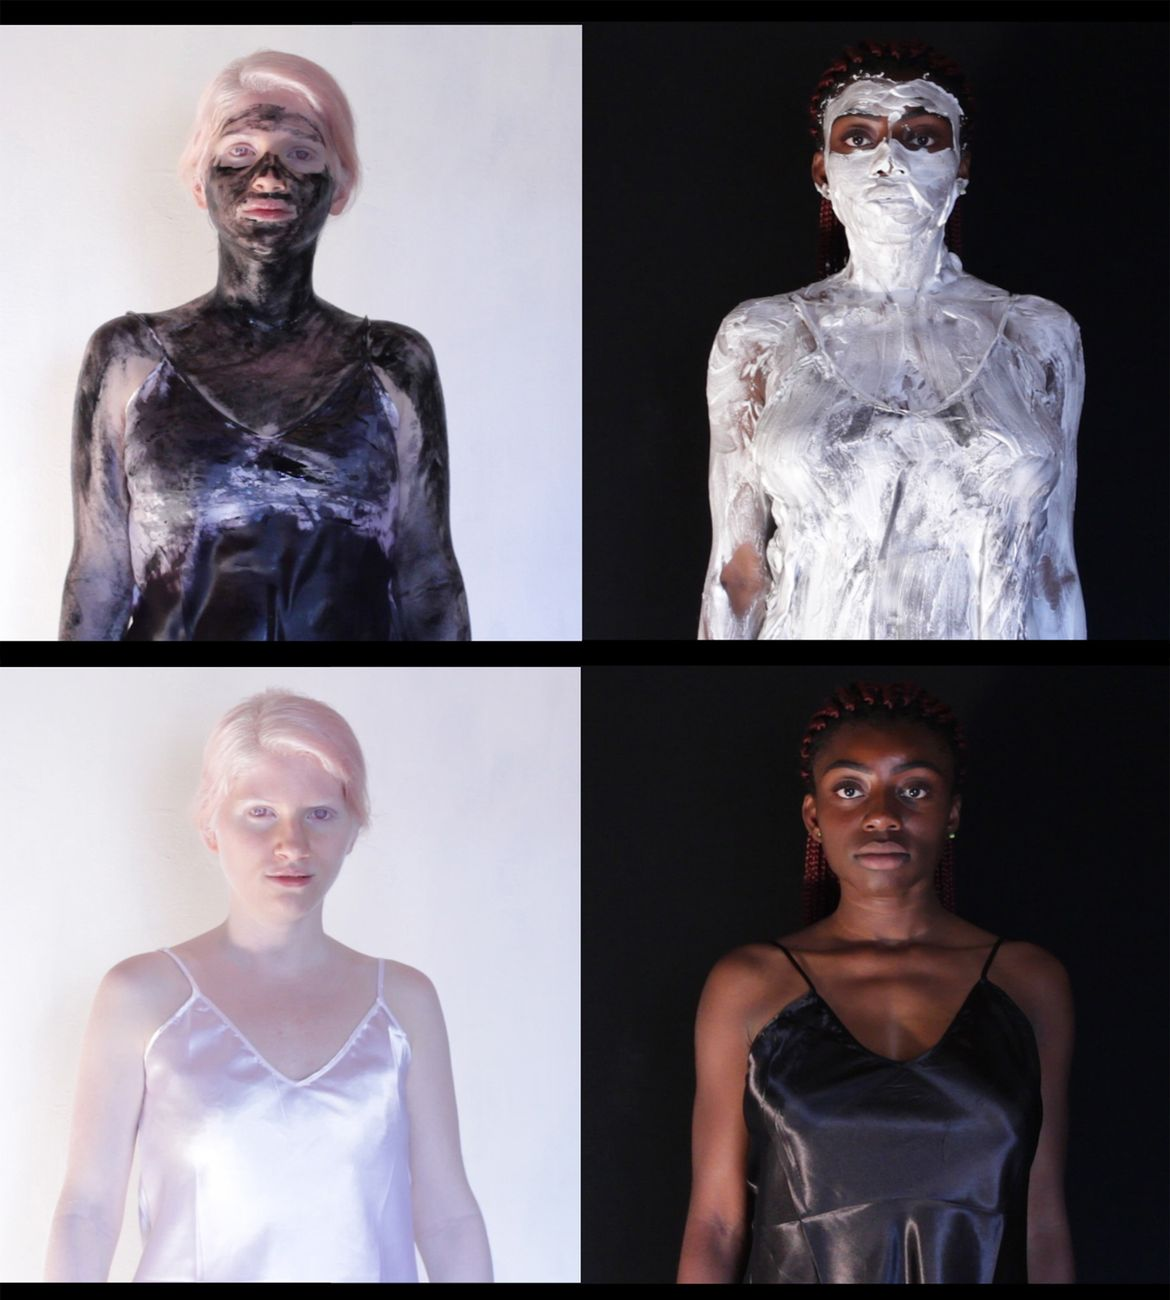 Martina Campanella, Nessun bianco o nero è trasparente, frame da video